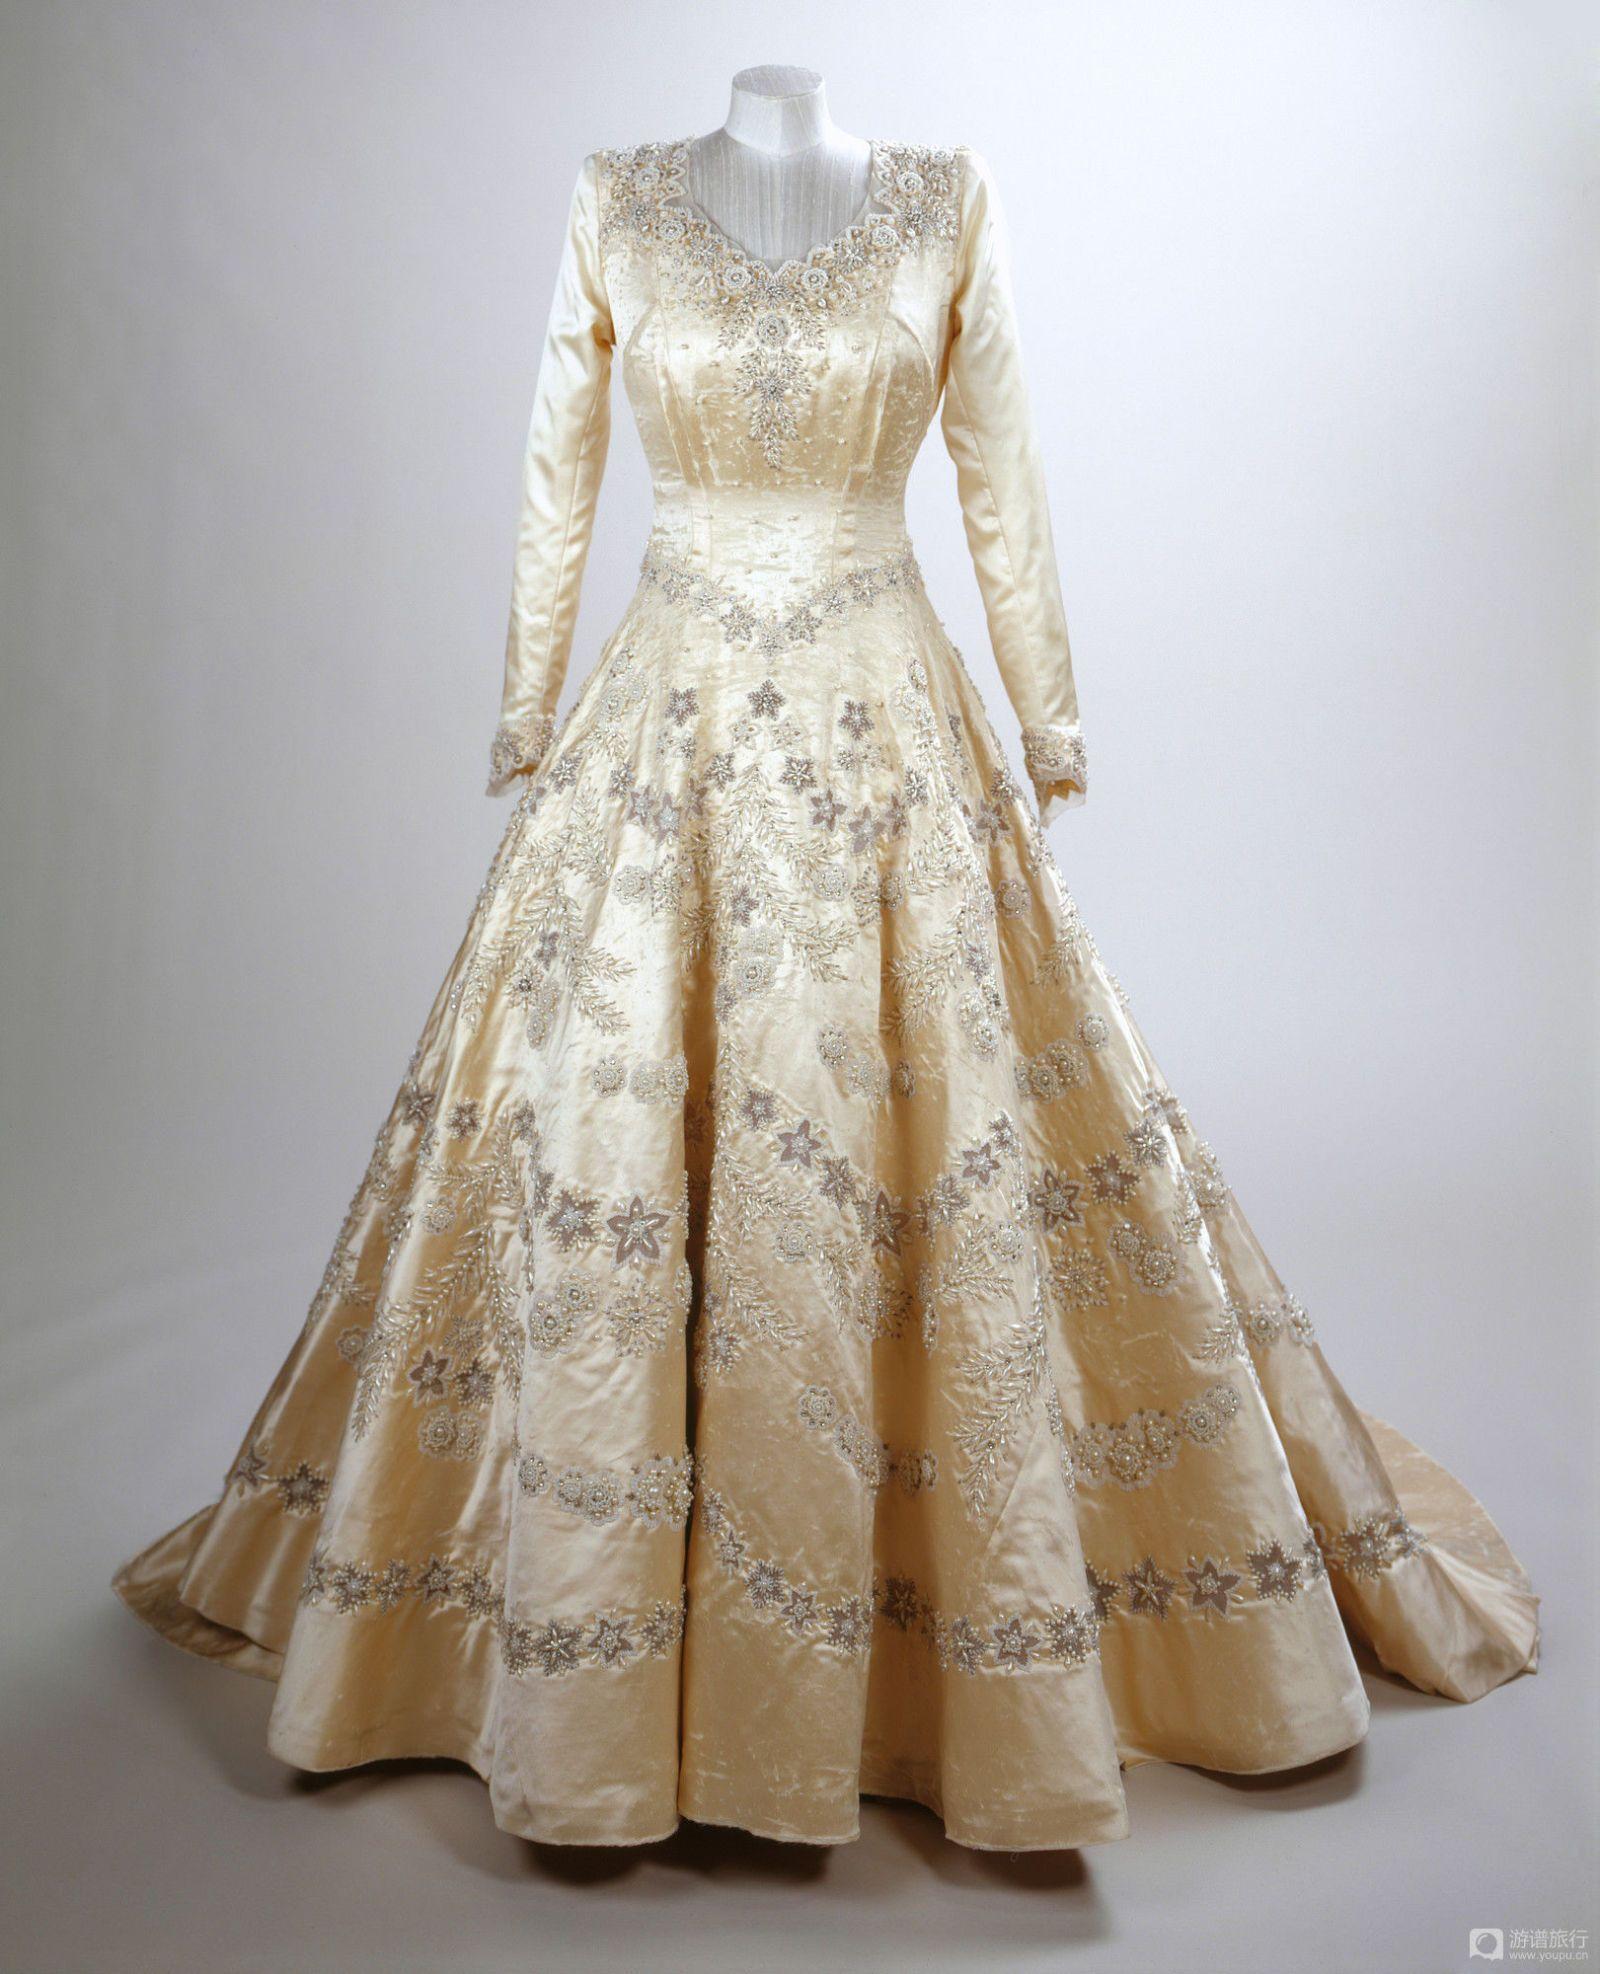 Off the wedding rack dresses los angeles